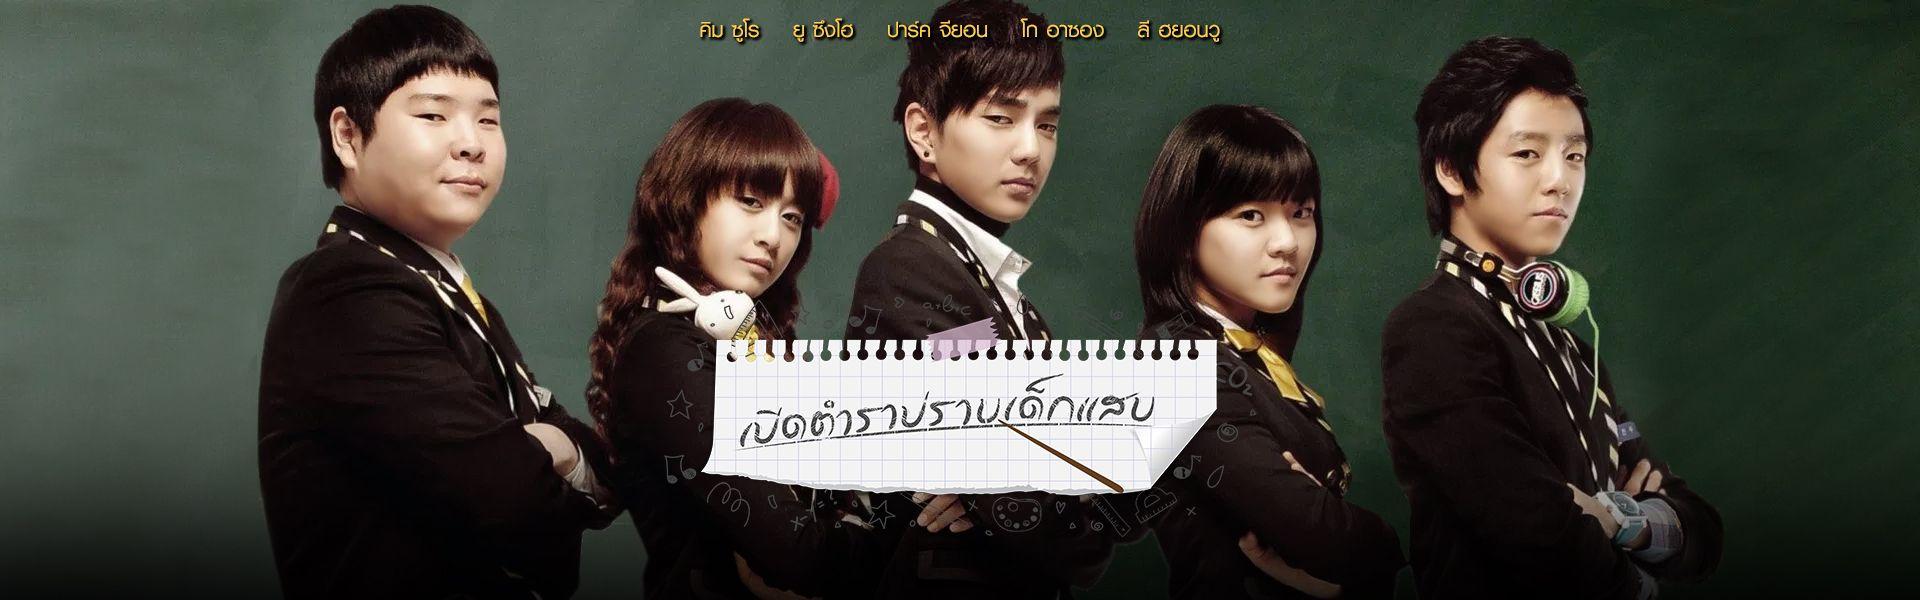 DVD/V2D Master of Study / God of Study เปิดตำราปราบเด็กแสบ 4 แผ่นจบ (พากย์ไทย)